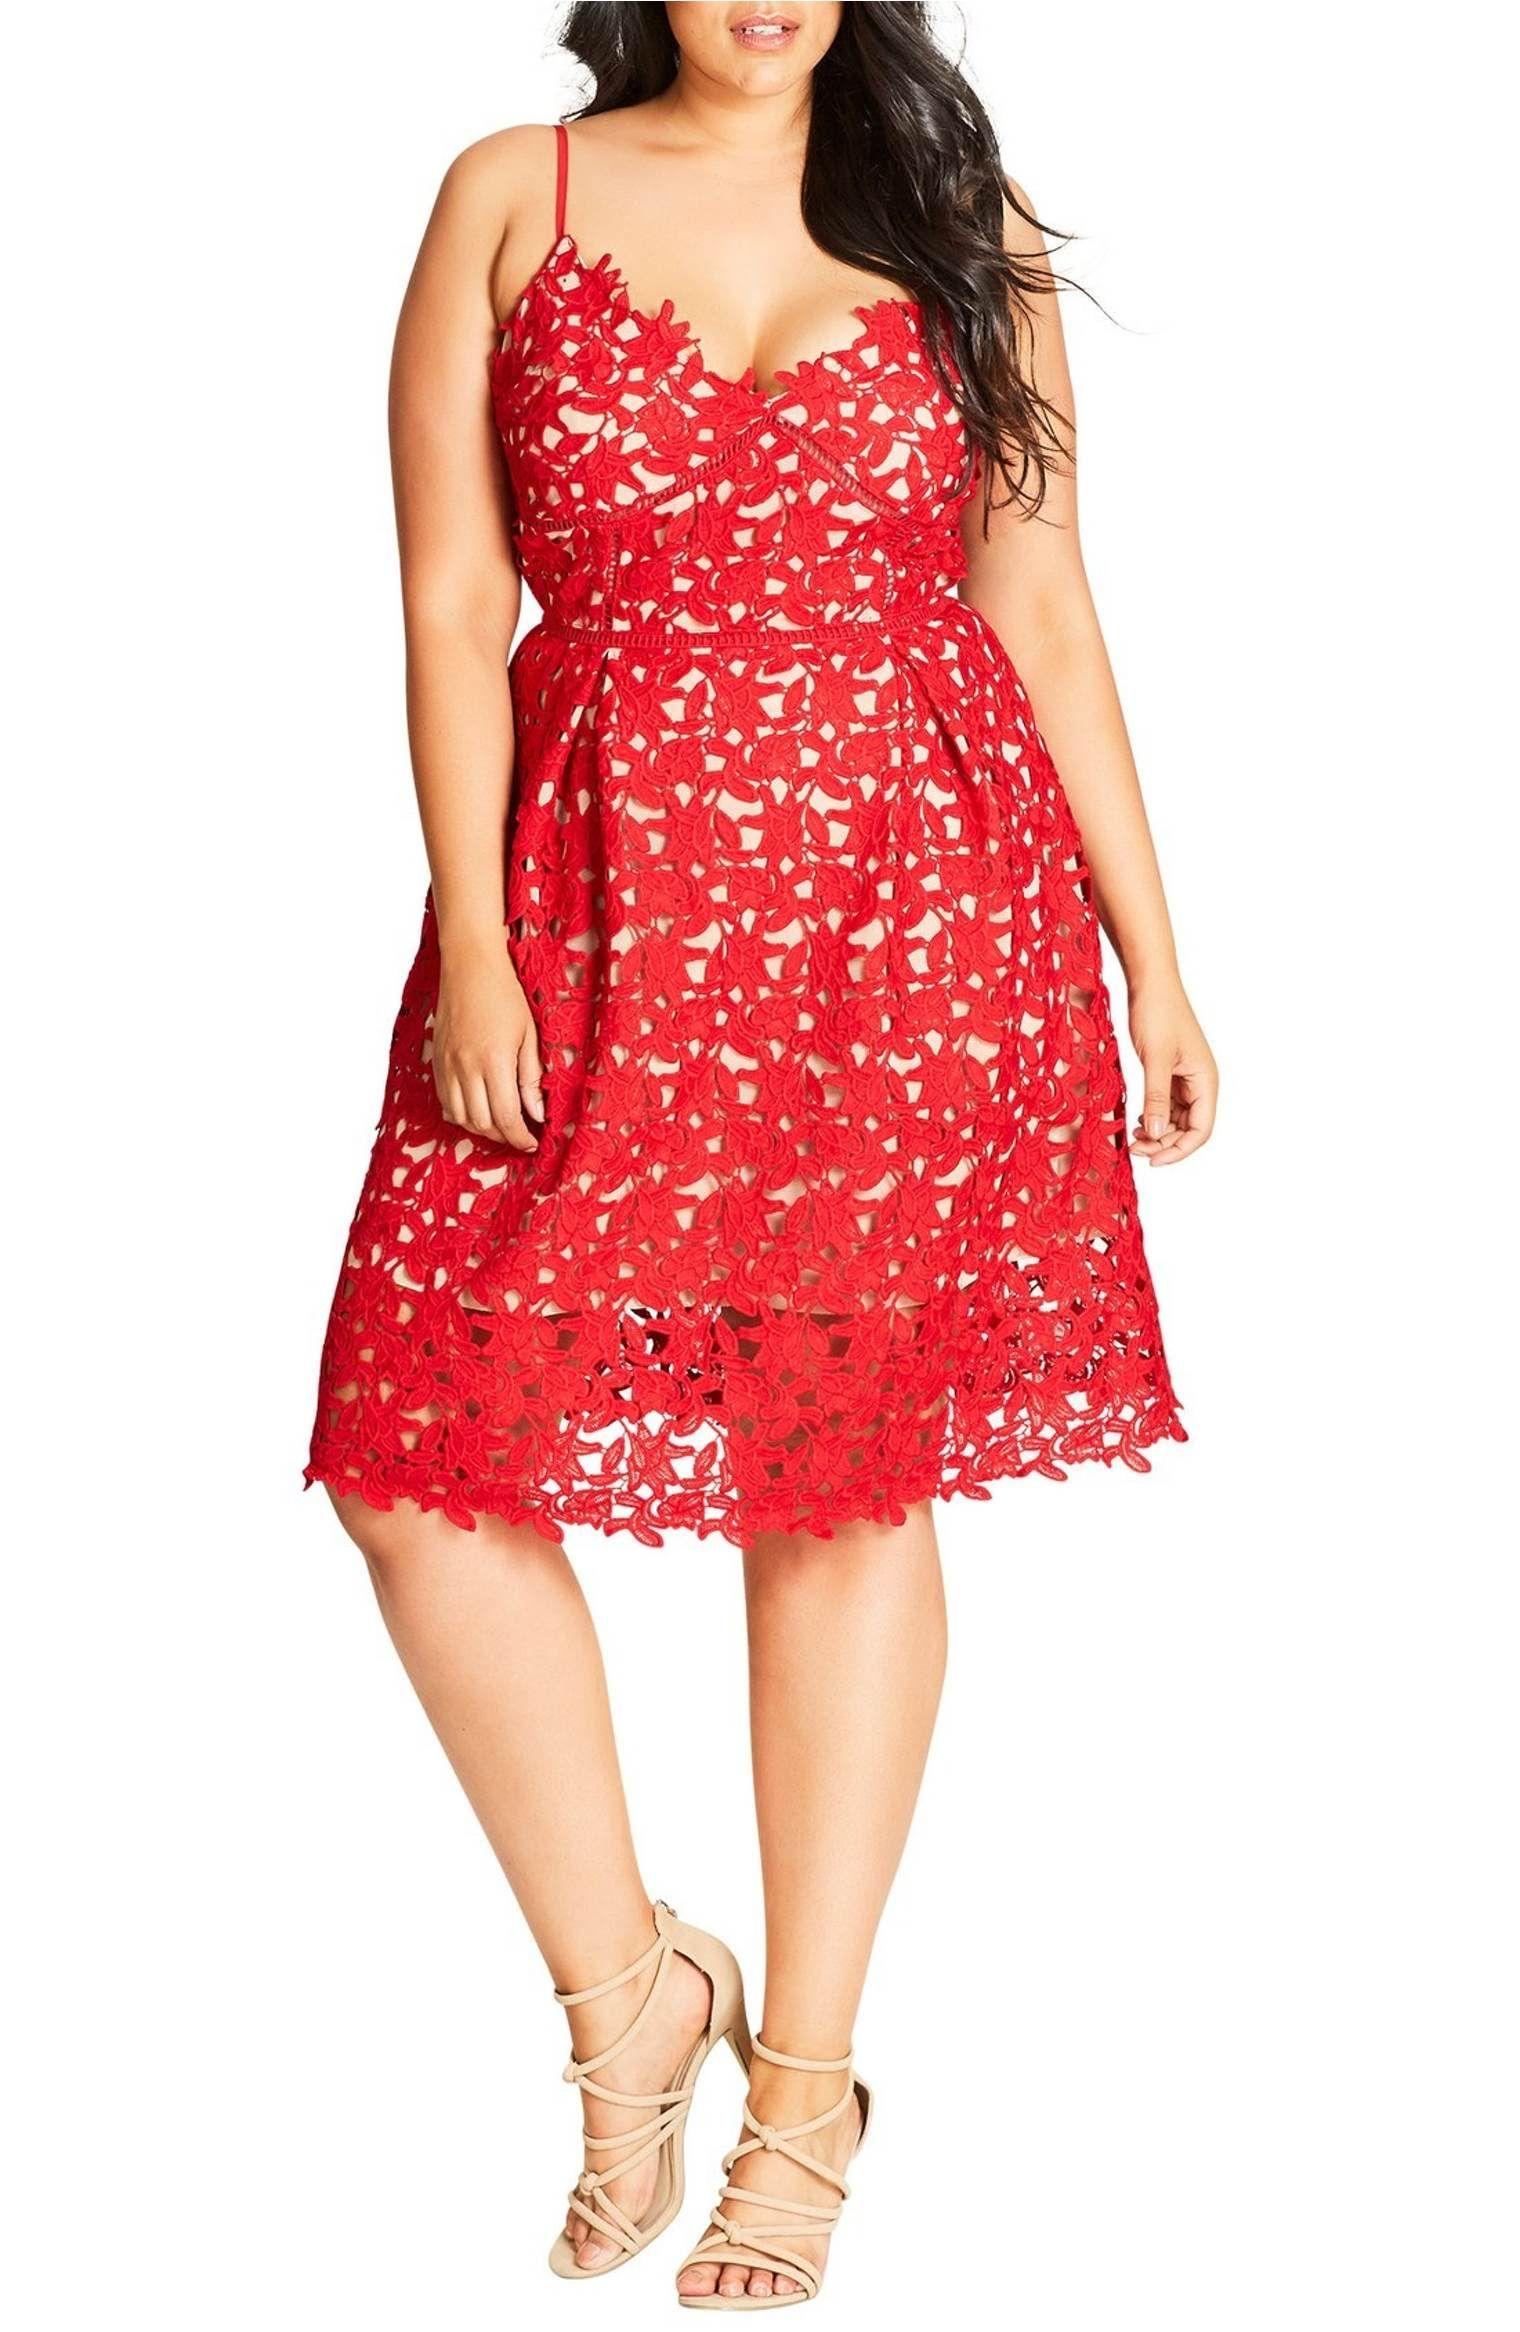 City Chic So Fancy Plus Size Lace Dress http://redirect.viglink.com?key=5ce86e9516080528f7ba581d707413d2&type=bk&u=http%3A%2F%2Fshop.nordstrom.com%2Fs%2Fcity-chic-so-fancy-lace-dress-plus-size%2F4455247%3Forigin%3Dkeywordsearch-personalizedsort%26fashioncolor%3DSCARLET